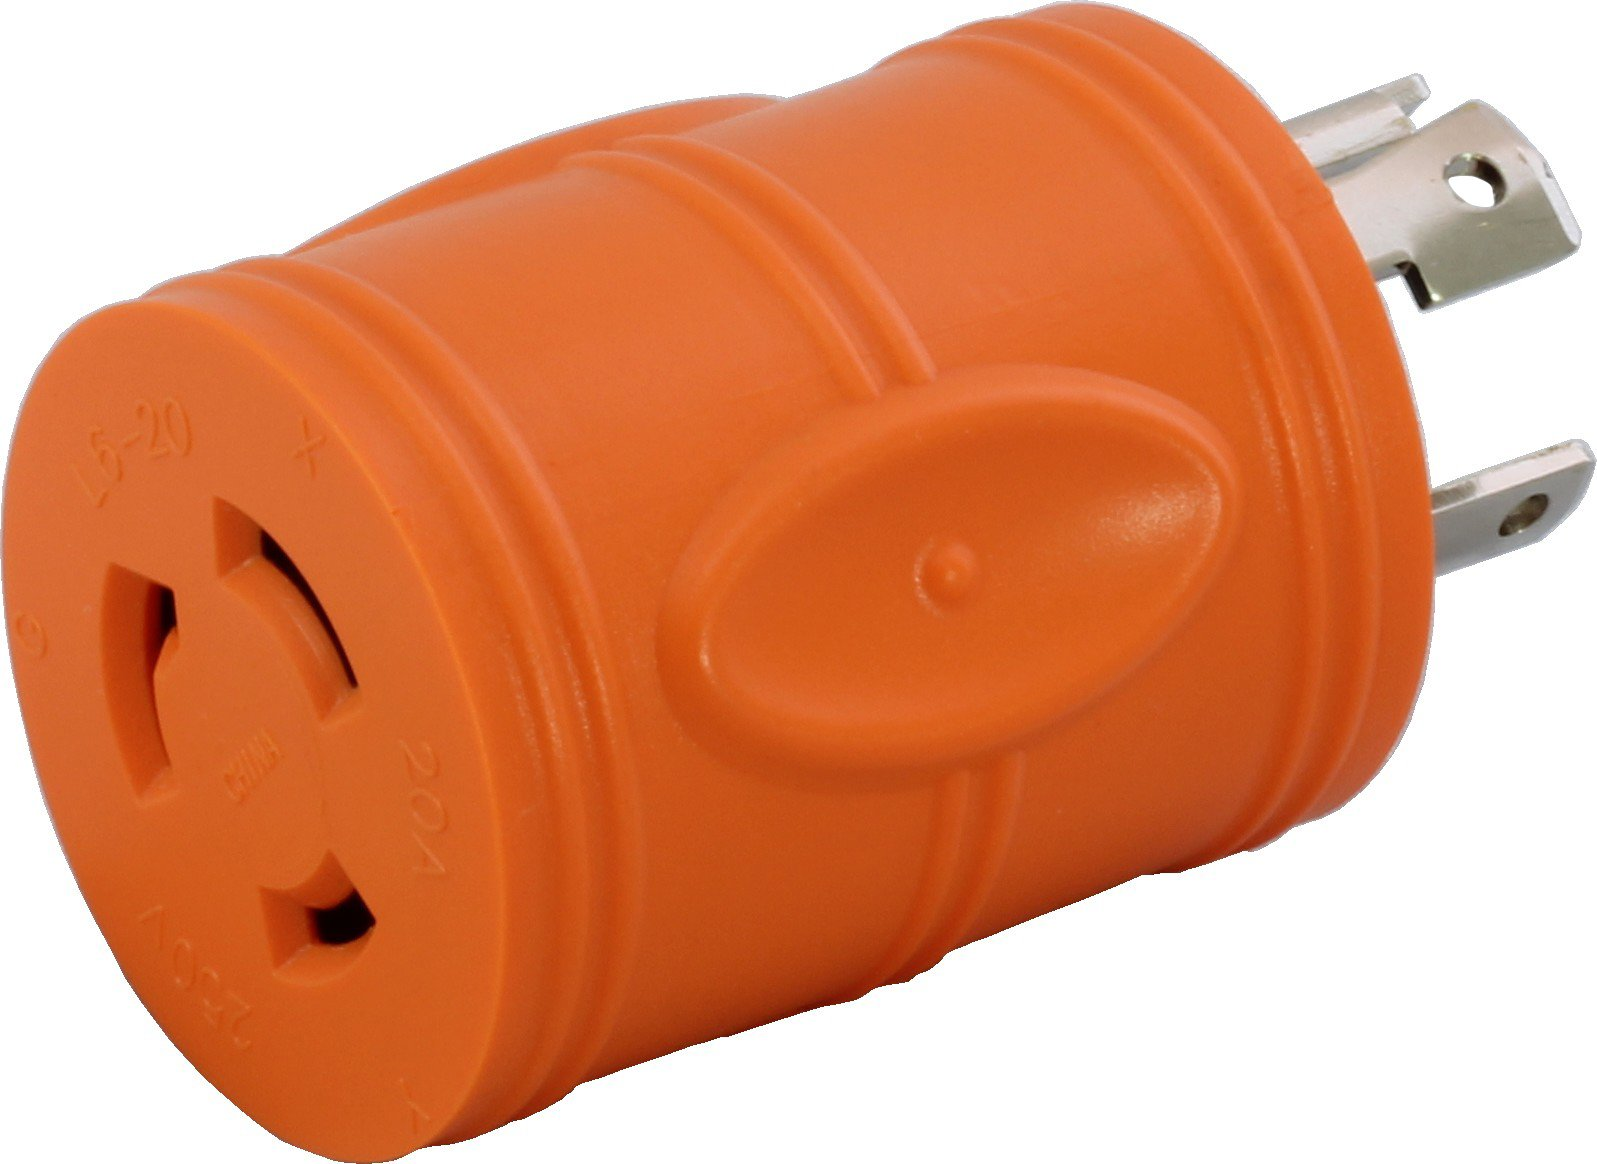 AC WORKS [ADL1430L620] Locking Adapter 4-Prong 30Amp 125/250Volt NEMA L14-30P Locking Plug to L6-20R 20Amp 250Volt Locking Female Connector